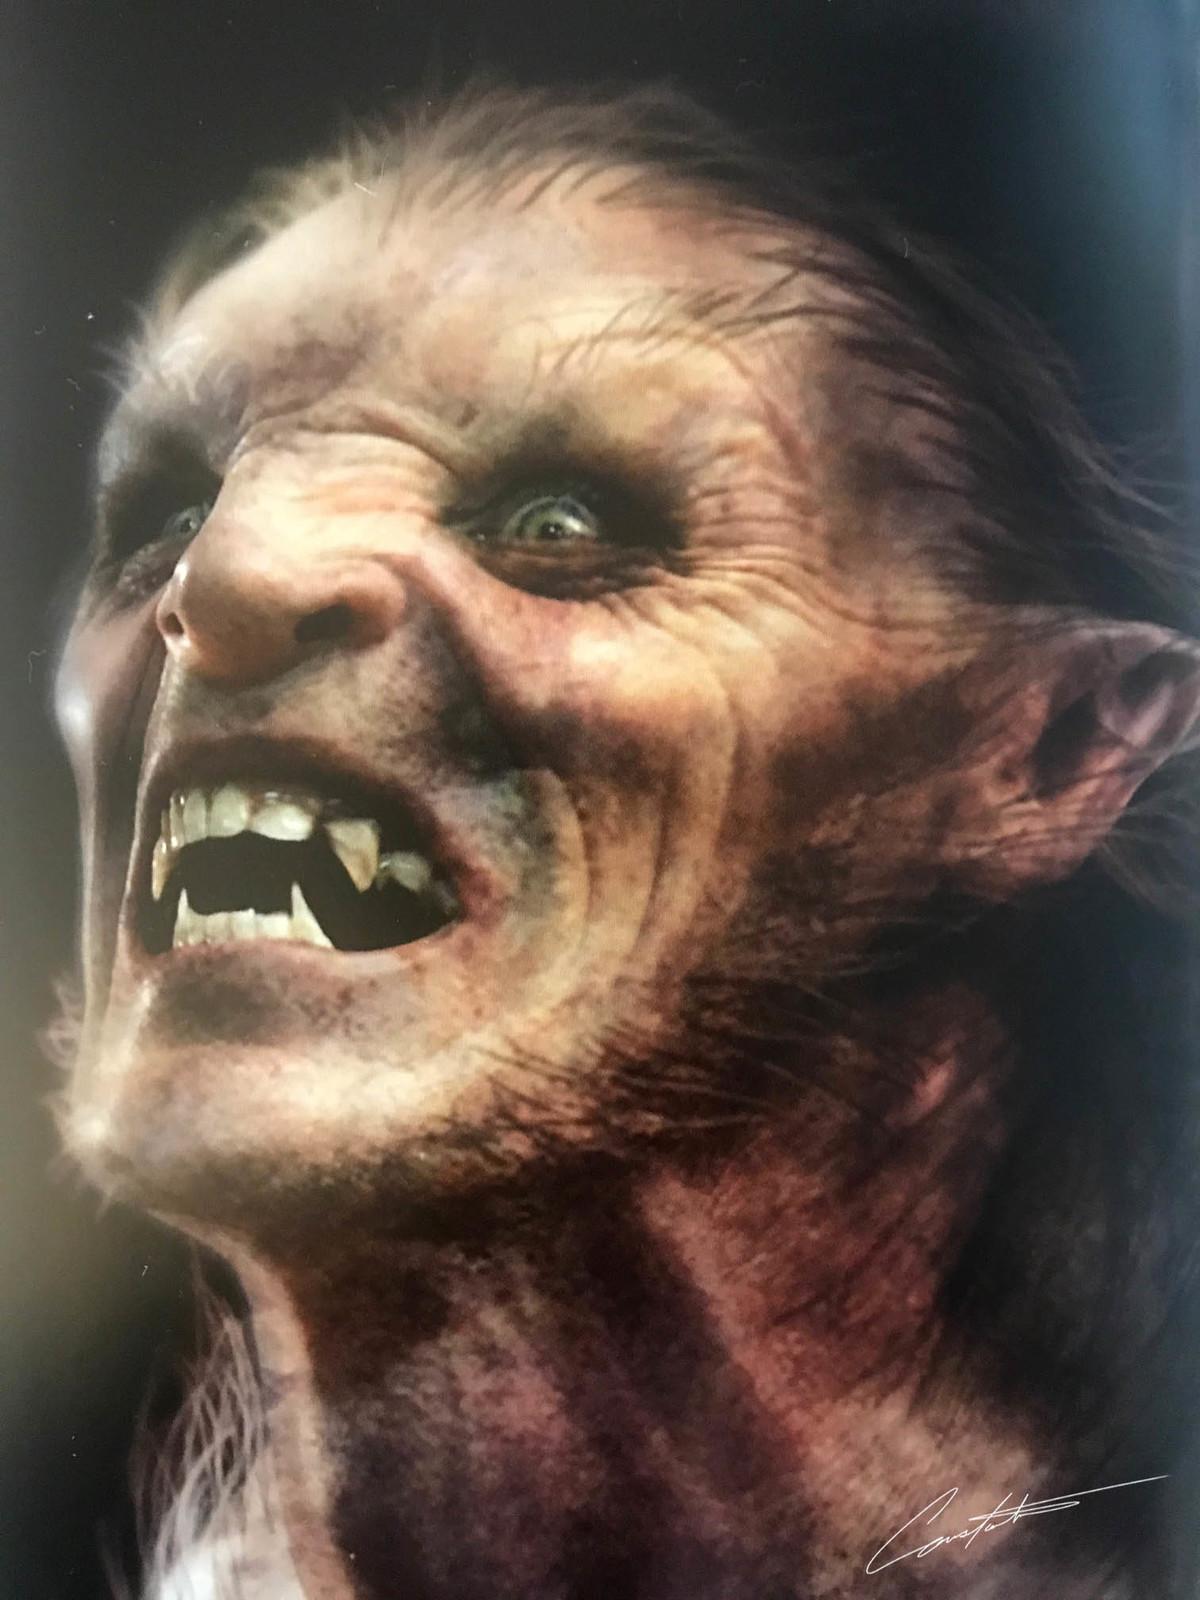 werewolf makeup design